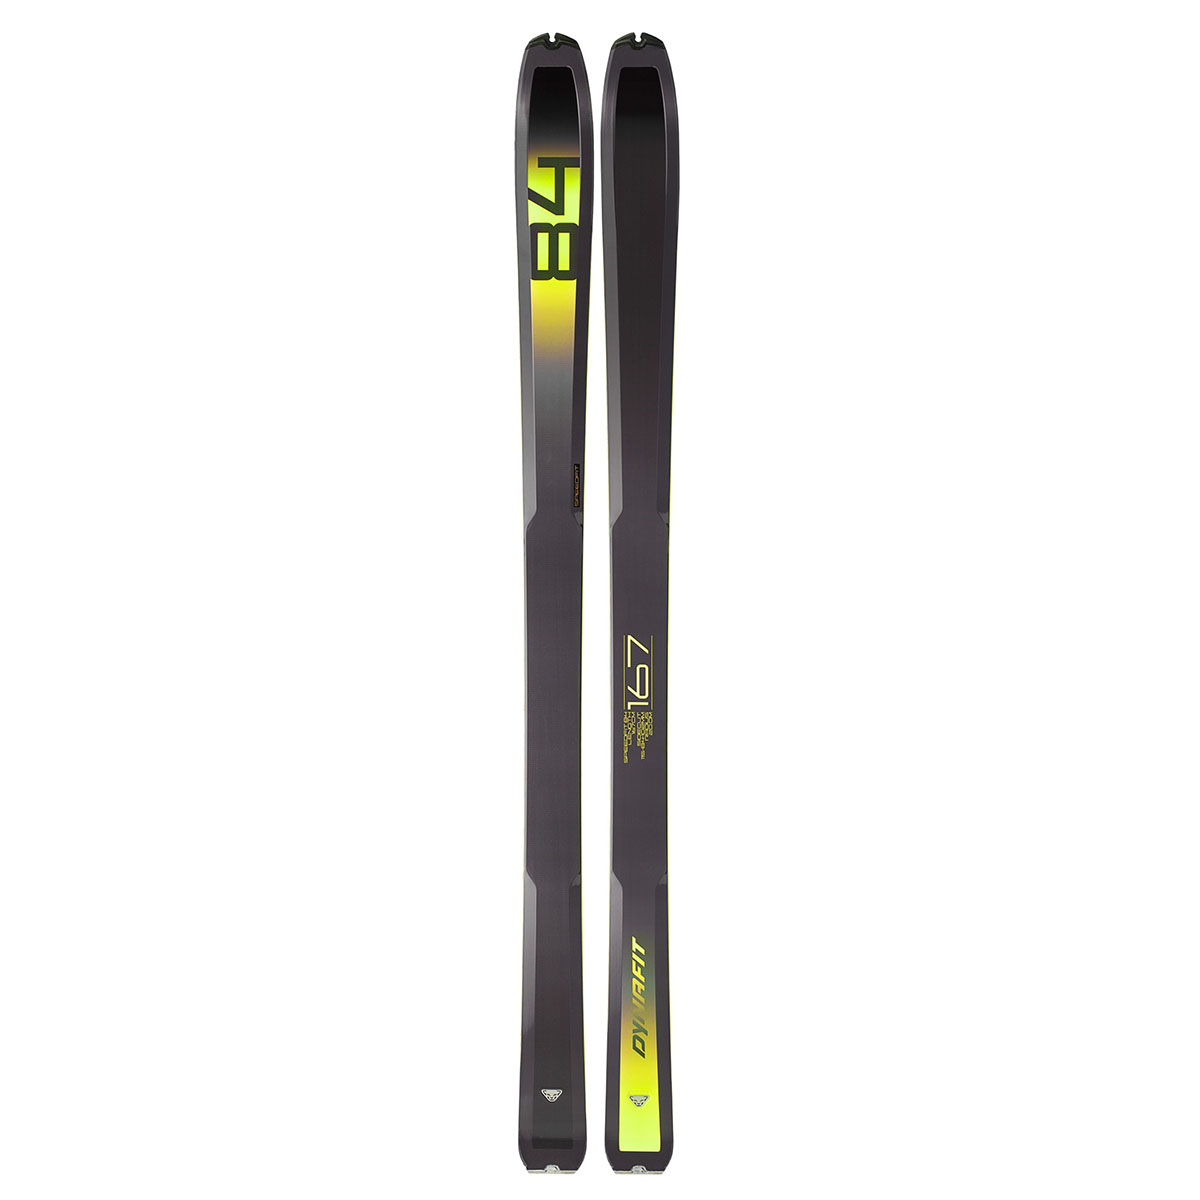 Dynafit Speedfit 84 Ski + AT Binding Packages